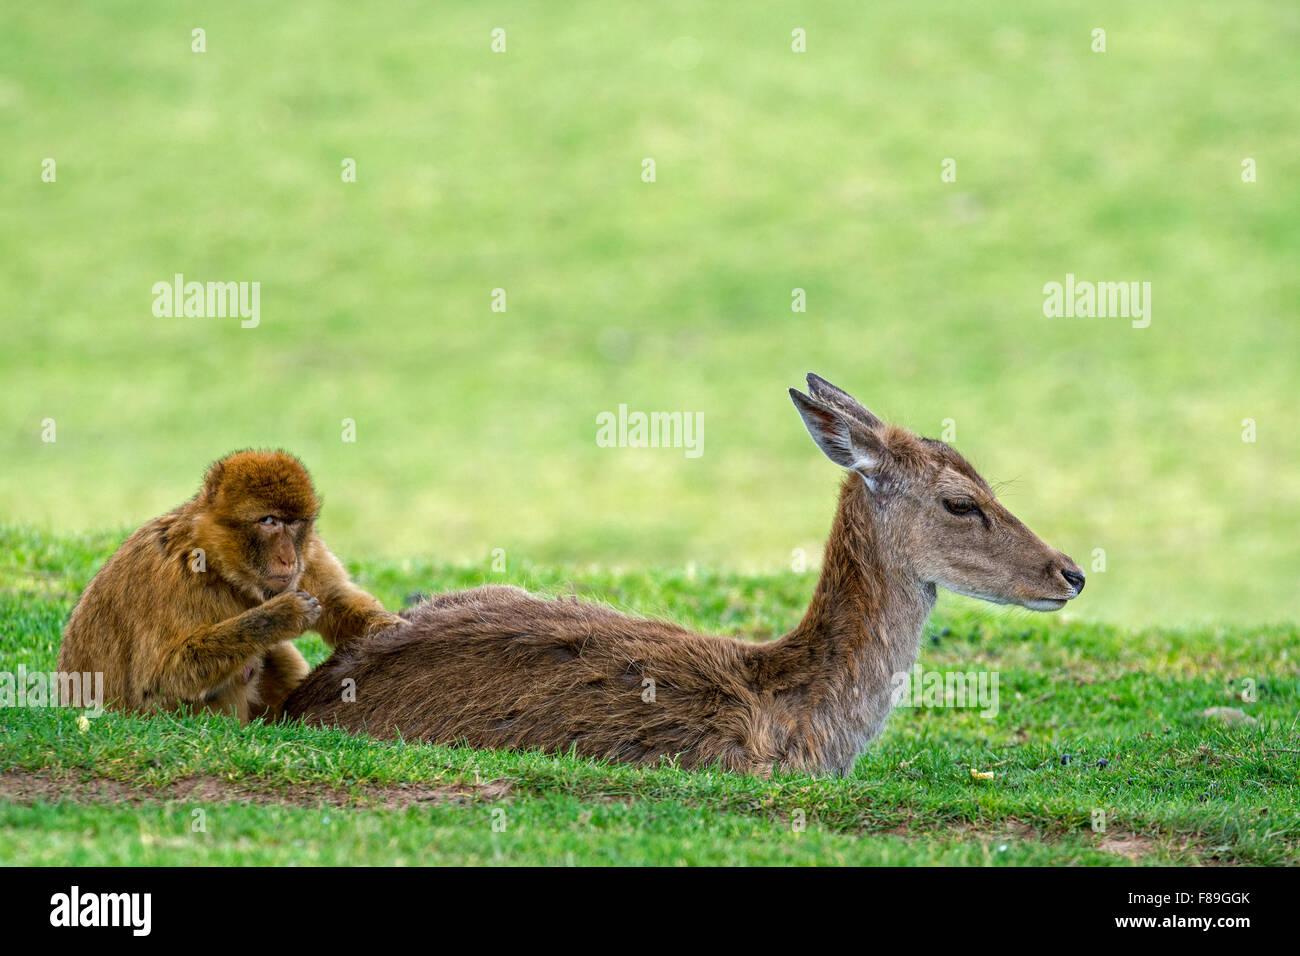 Berberaffe / Barbary ape / Magot (Macaca Sylvanus) Affenarten stammt aus Nord-Afrika und Gibraltar Pflege Hirsch Stockbild